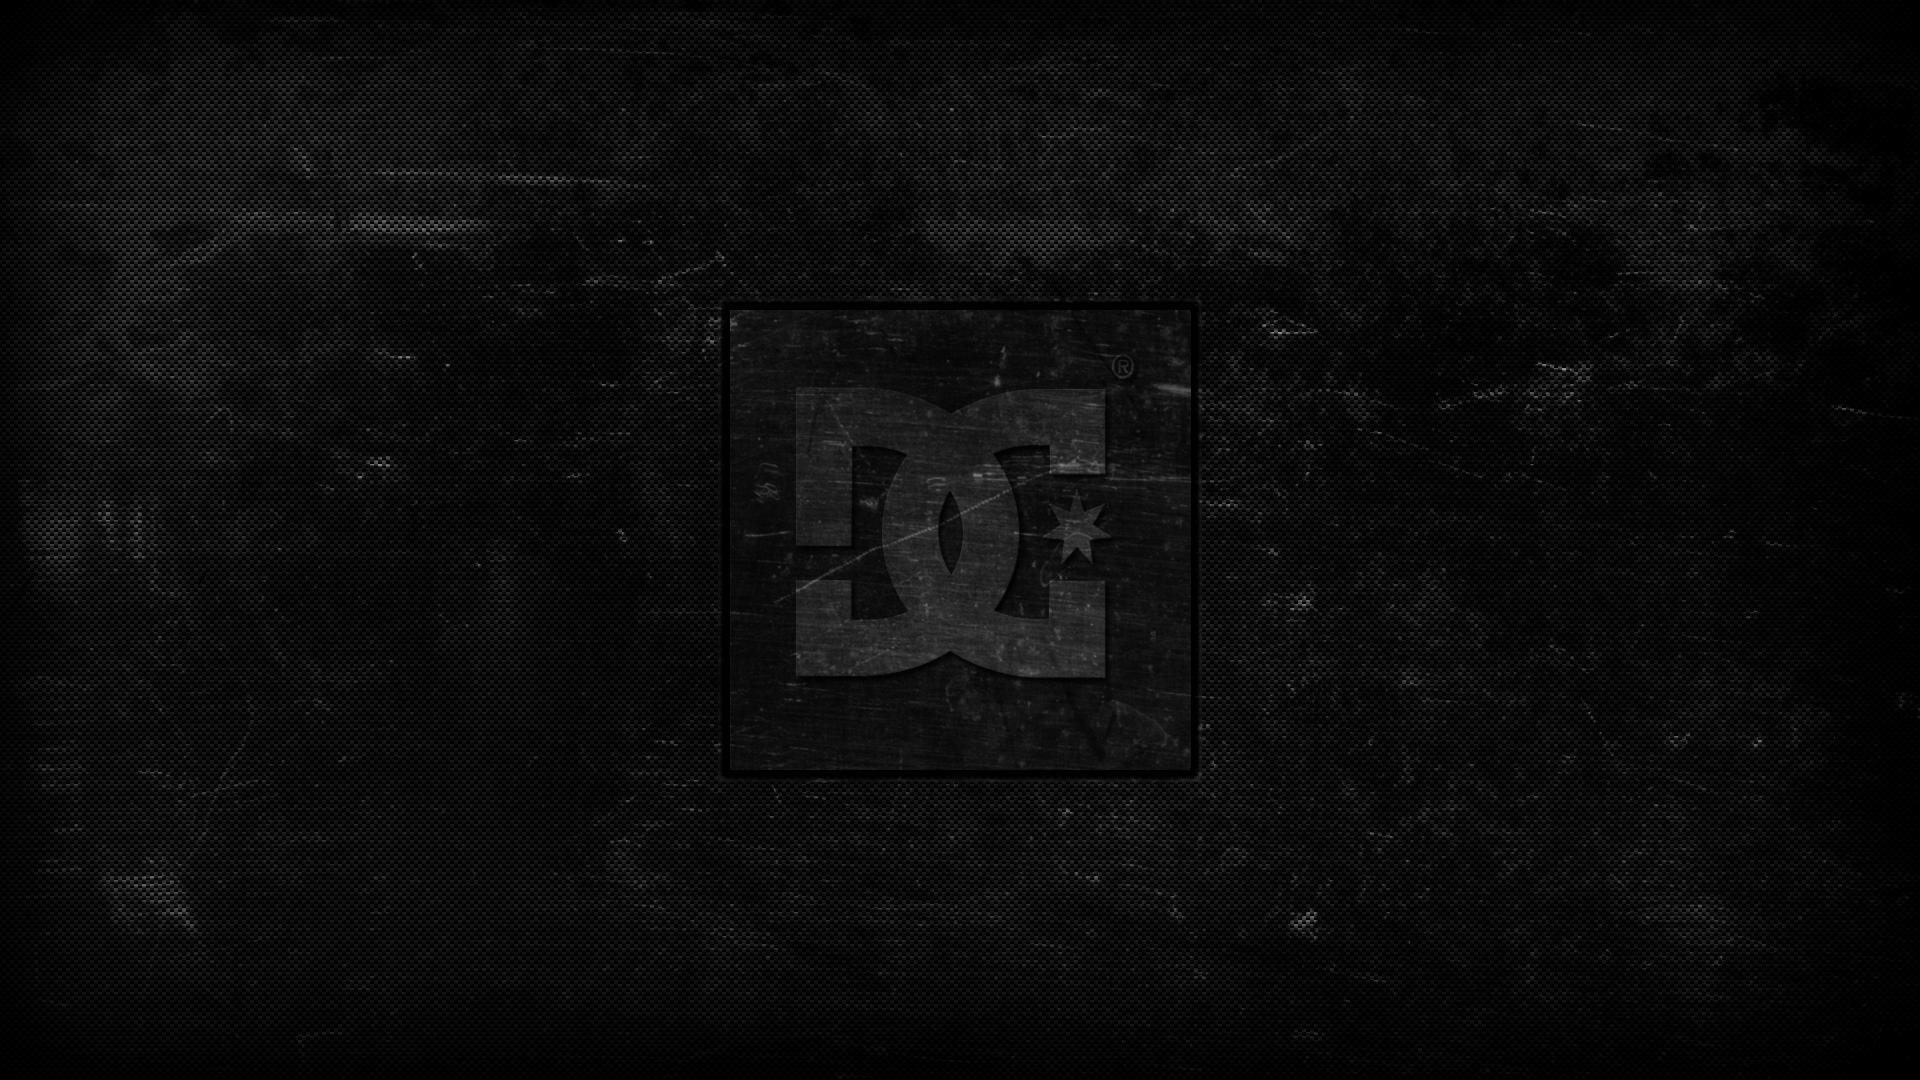 Ultra Hd Bmw Logo Wallpaper Hd